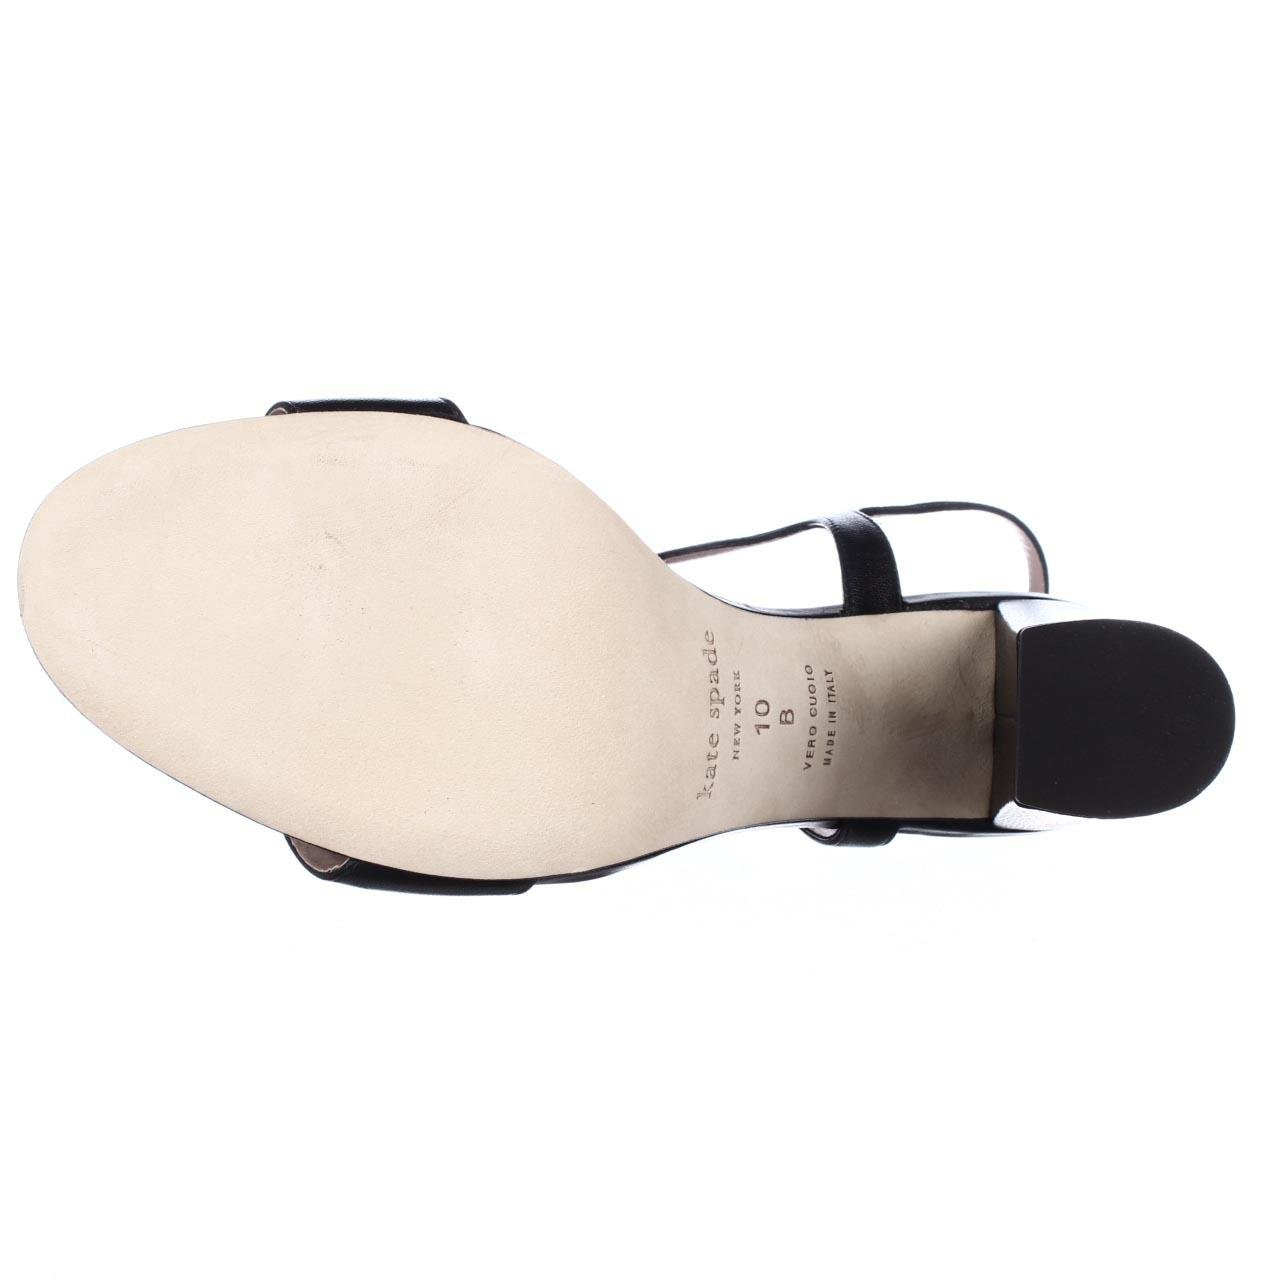 df82741959e0 Amazon.com  Kate Spade New York Women s Imorana Sandals